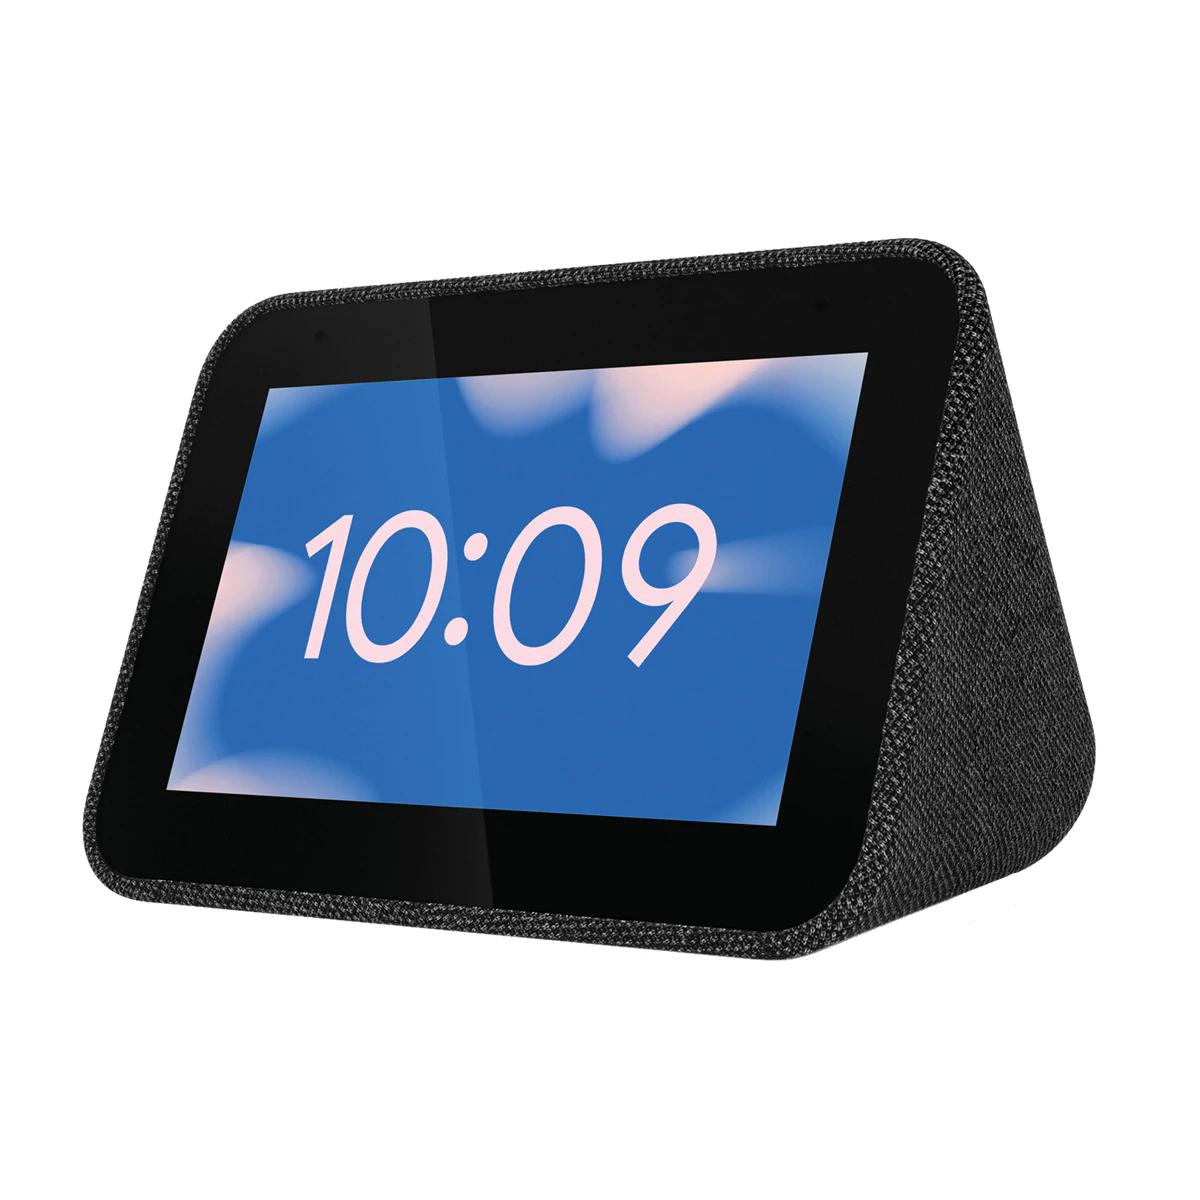 Lenovo Smart Clock con Asistente de Google